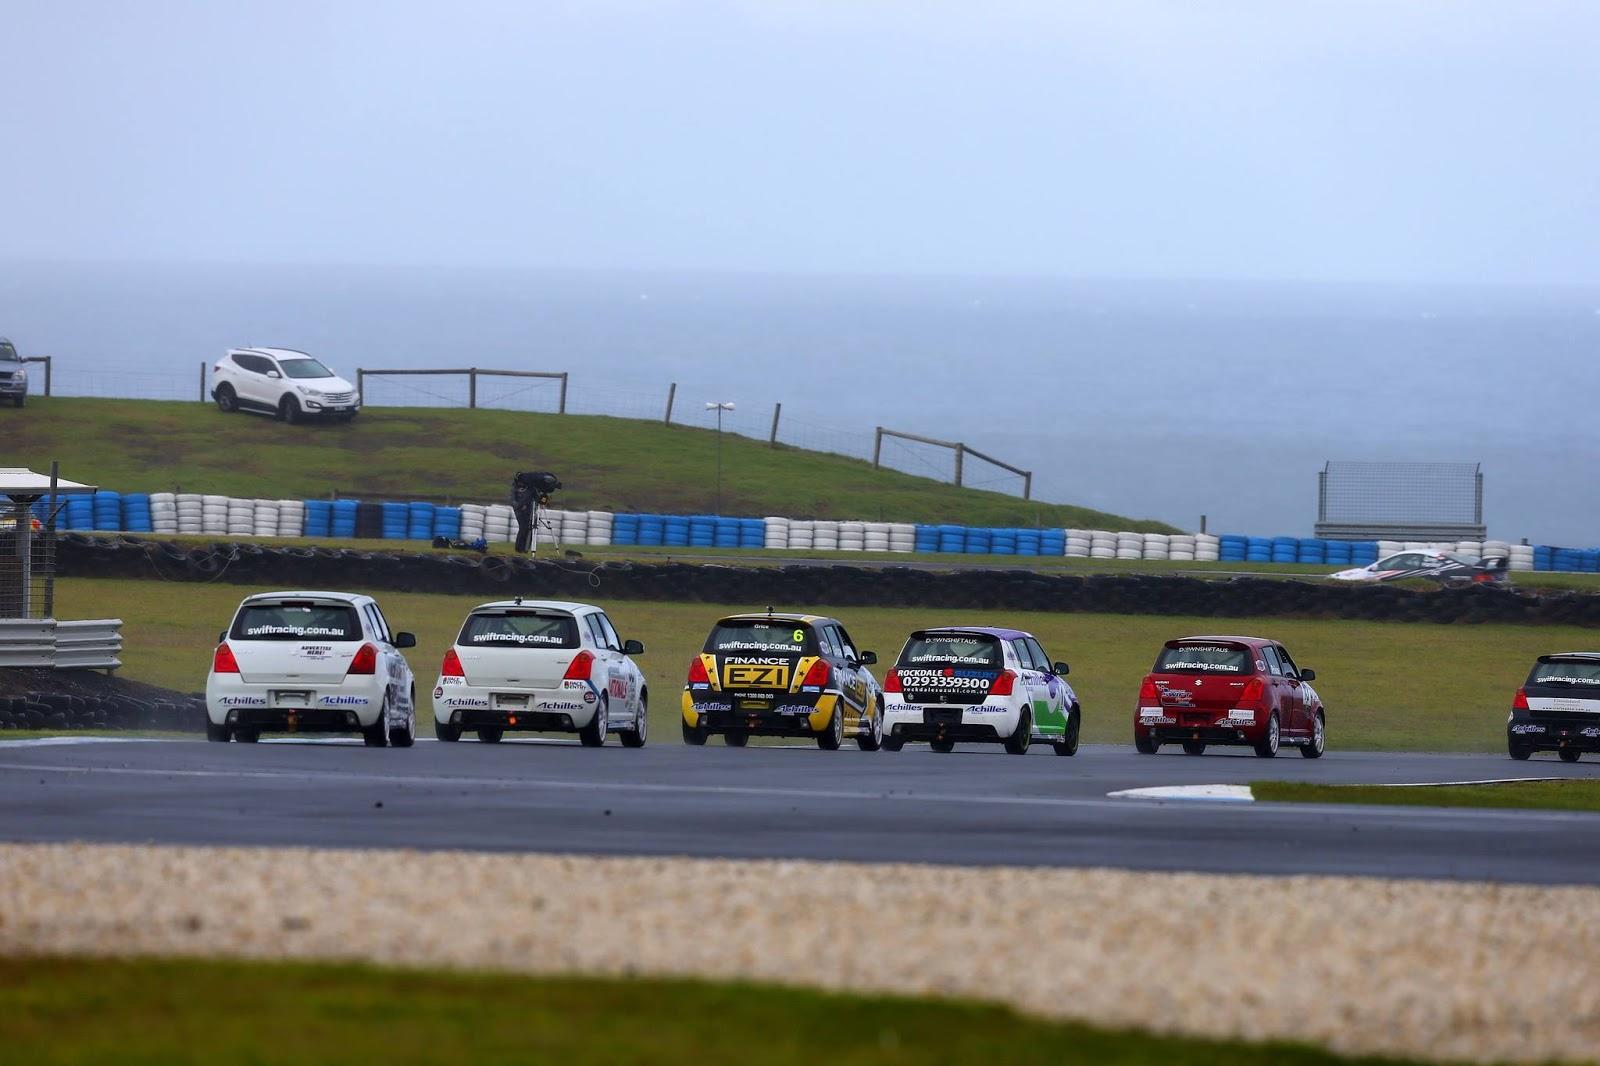 Australian Swift Racing Series, sport, wyścigi, racing, suzuki